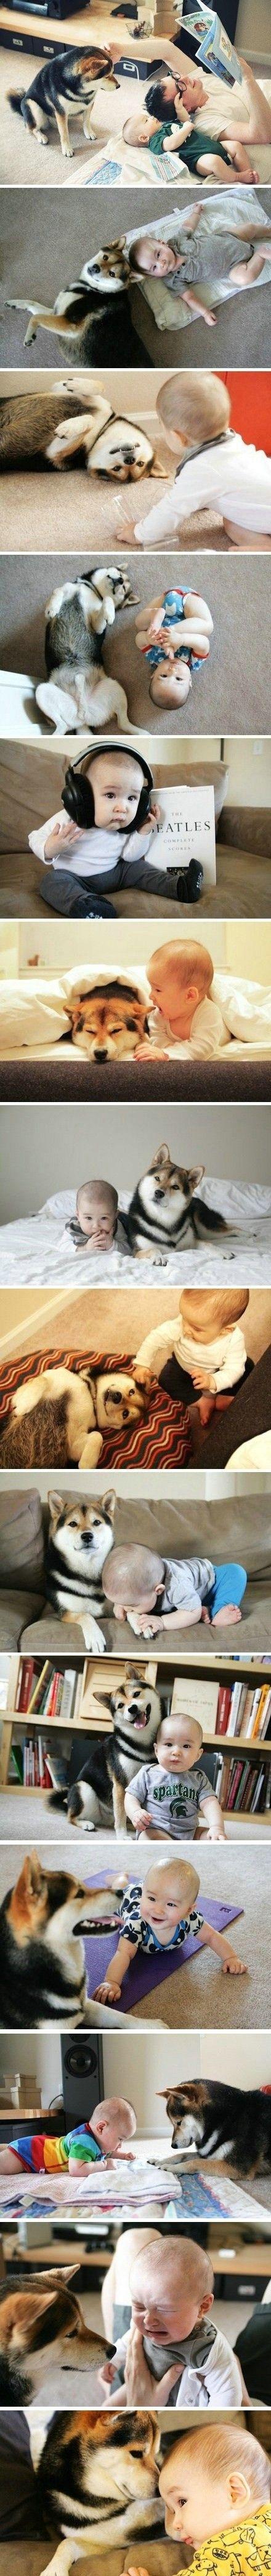 Family Portraits, cute, cute, cute!  Shiba Inu & baby interactions